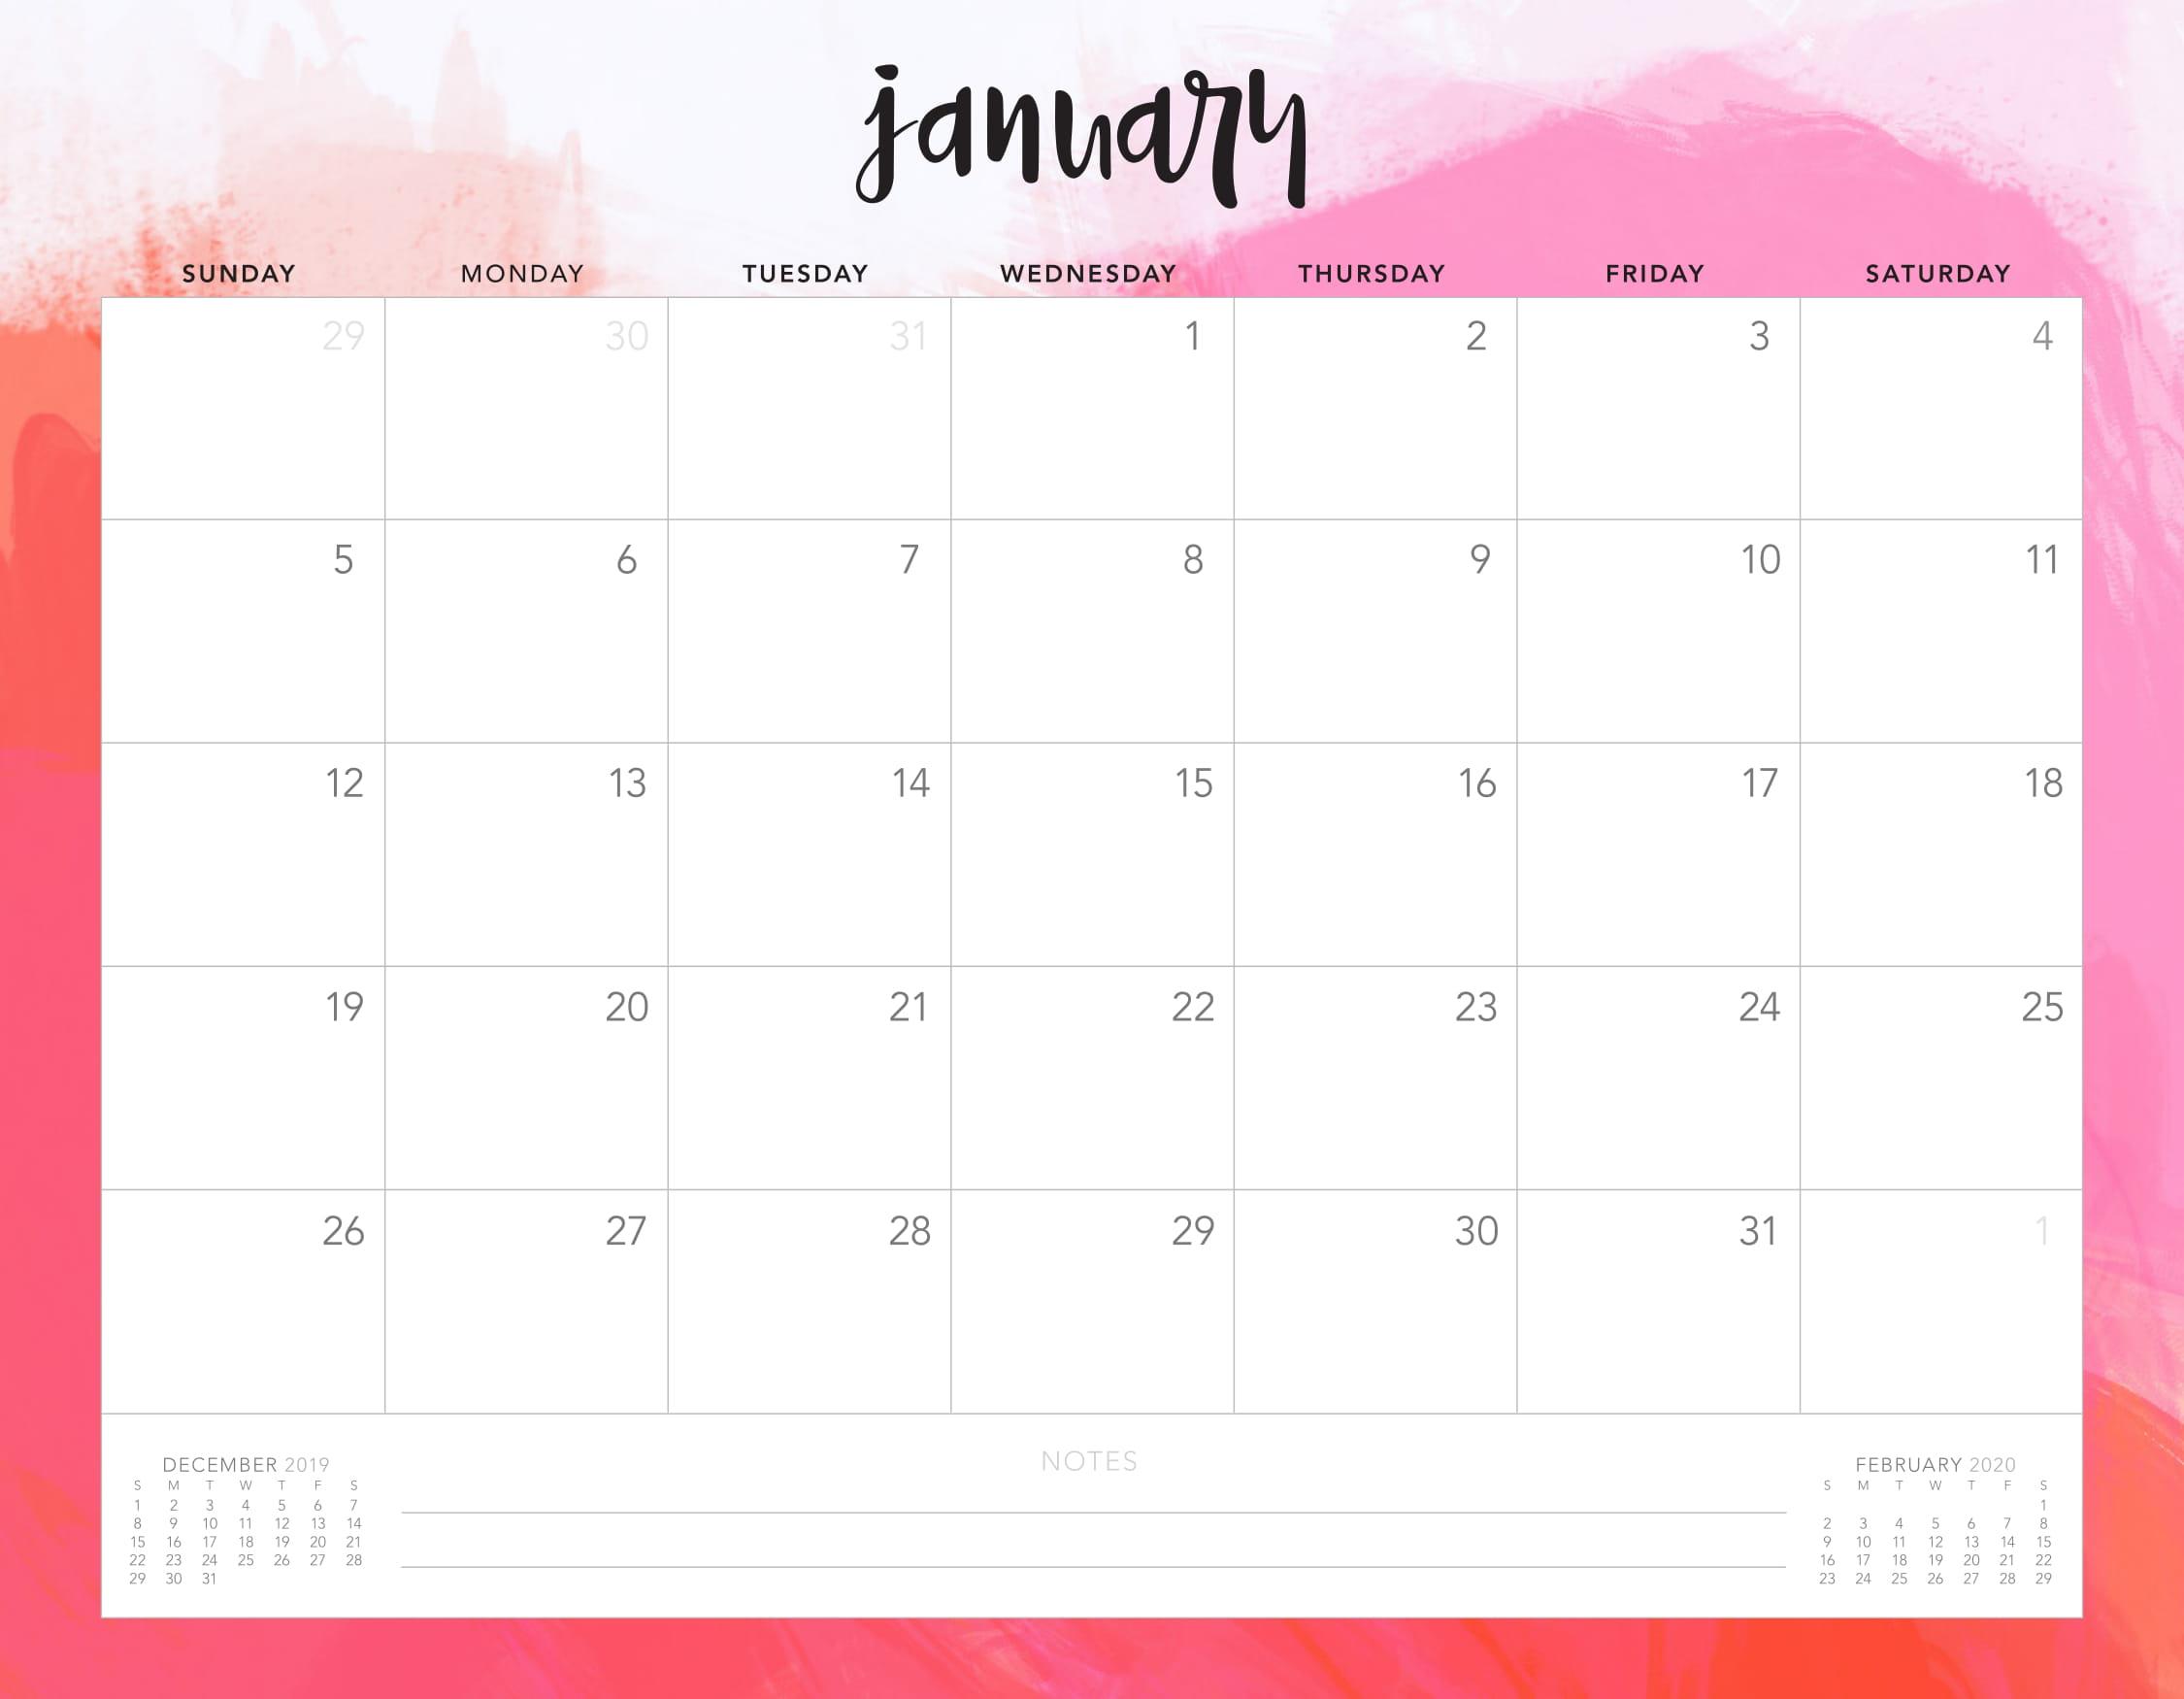 Free Calendar For January 2020 Editable | Free Printable